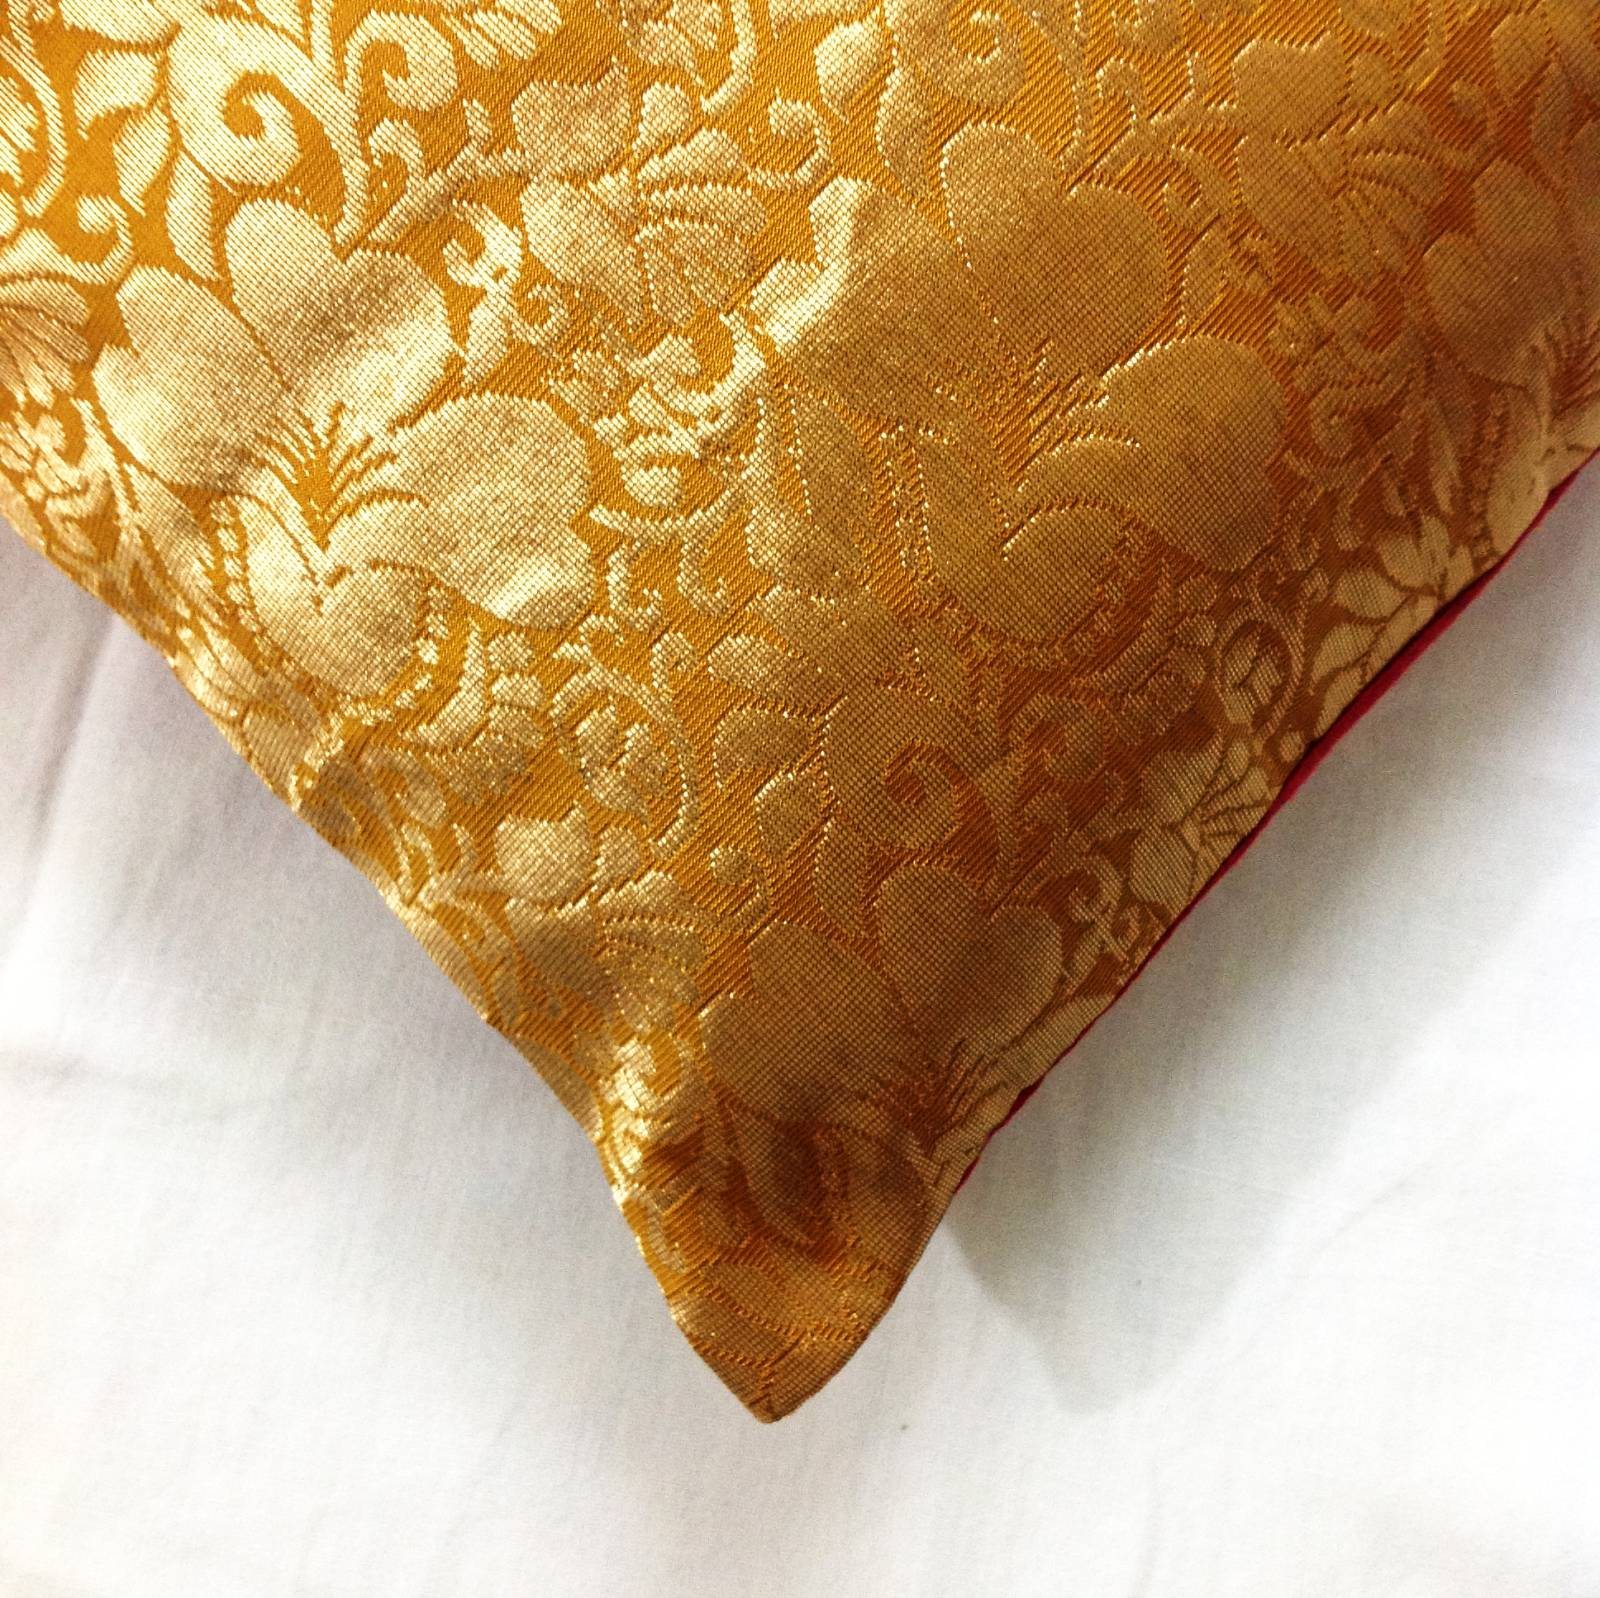 Silk Pillows And Shams: Indian Silk Pillows